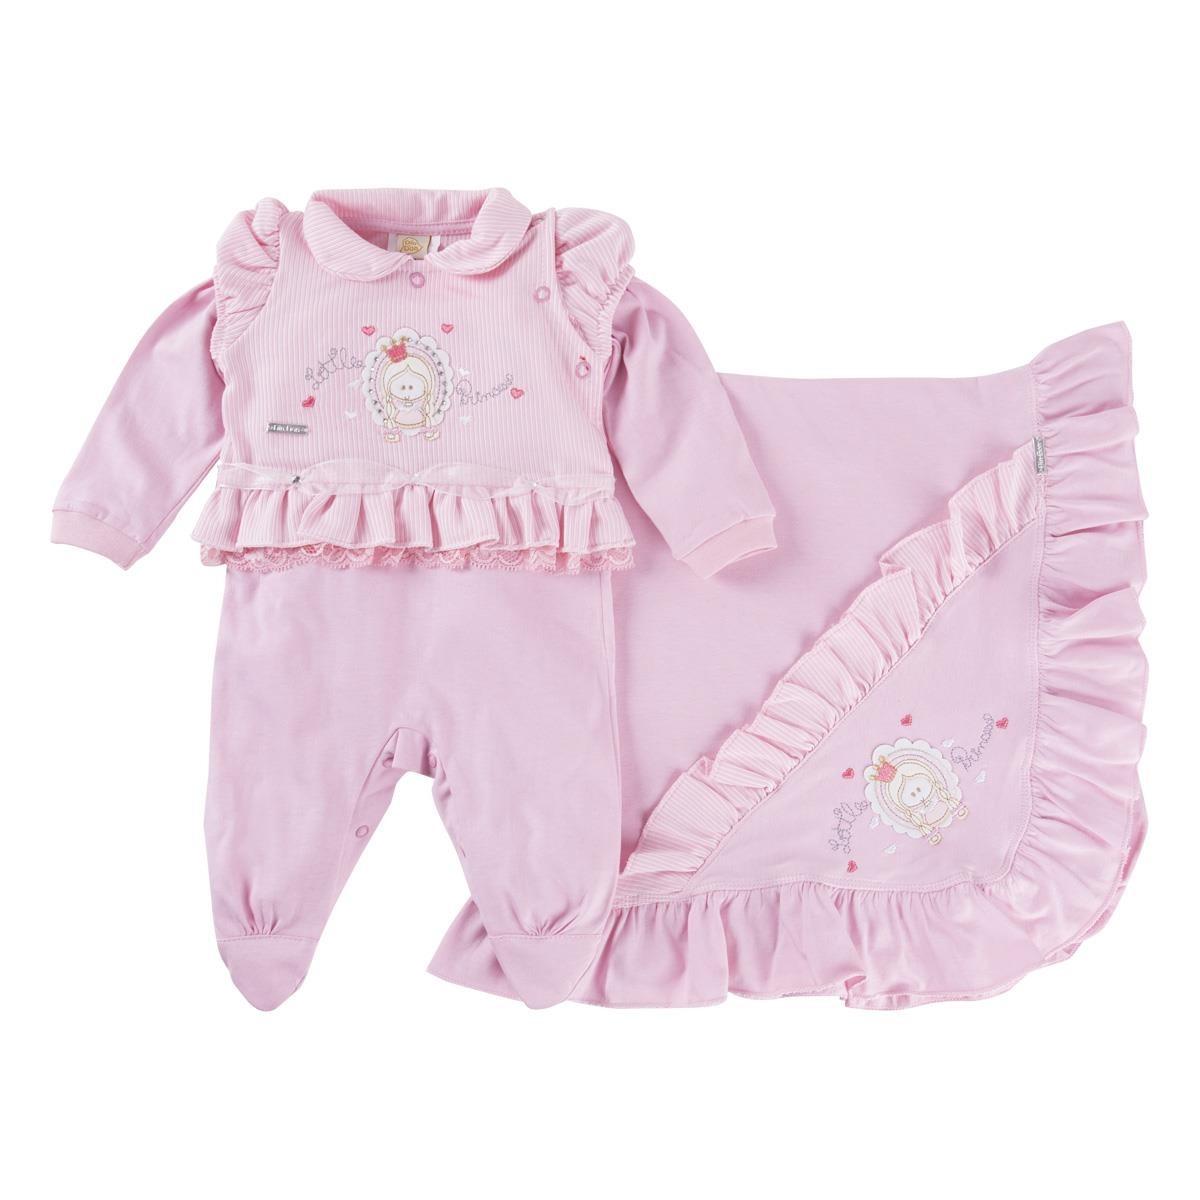 ddfaaf5056 kit saída maternidade menina din don luxo bordado princesa. Carregando zoom.